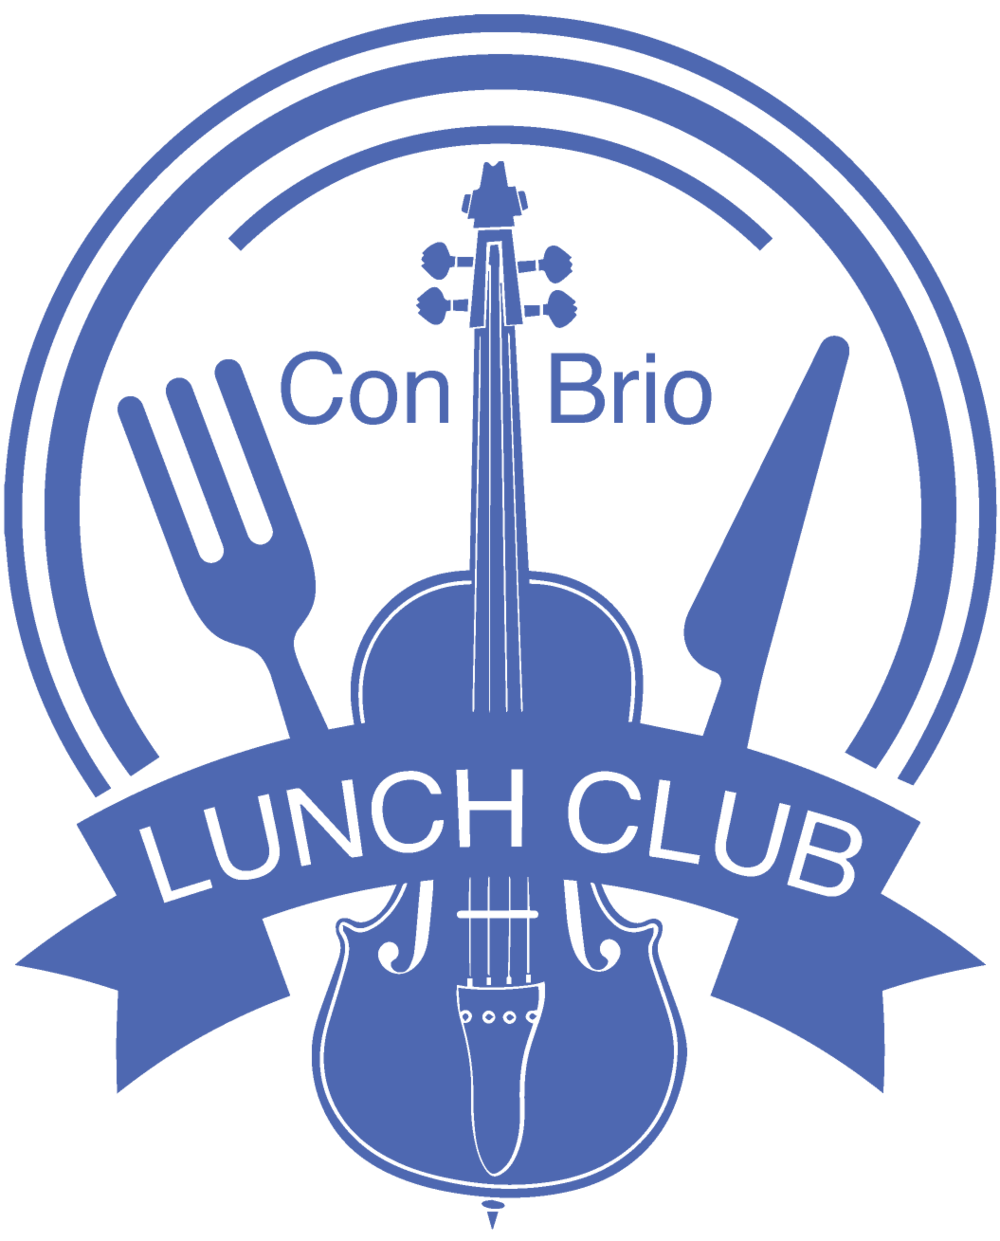 cblc logo.png